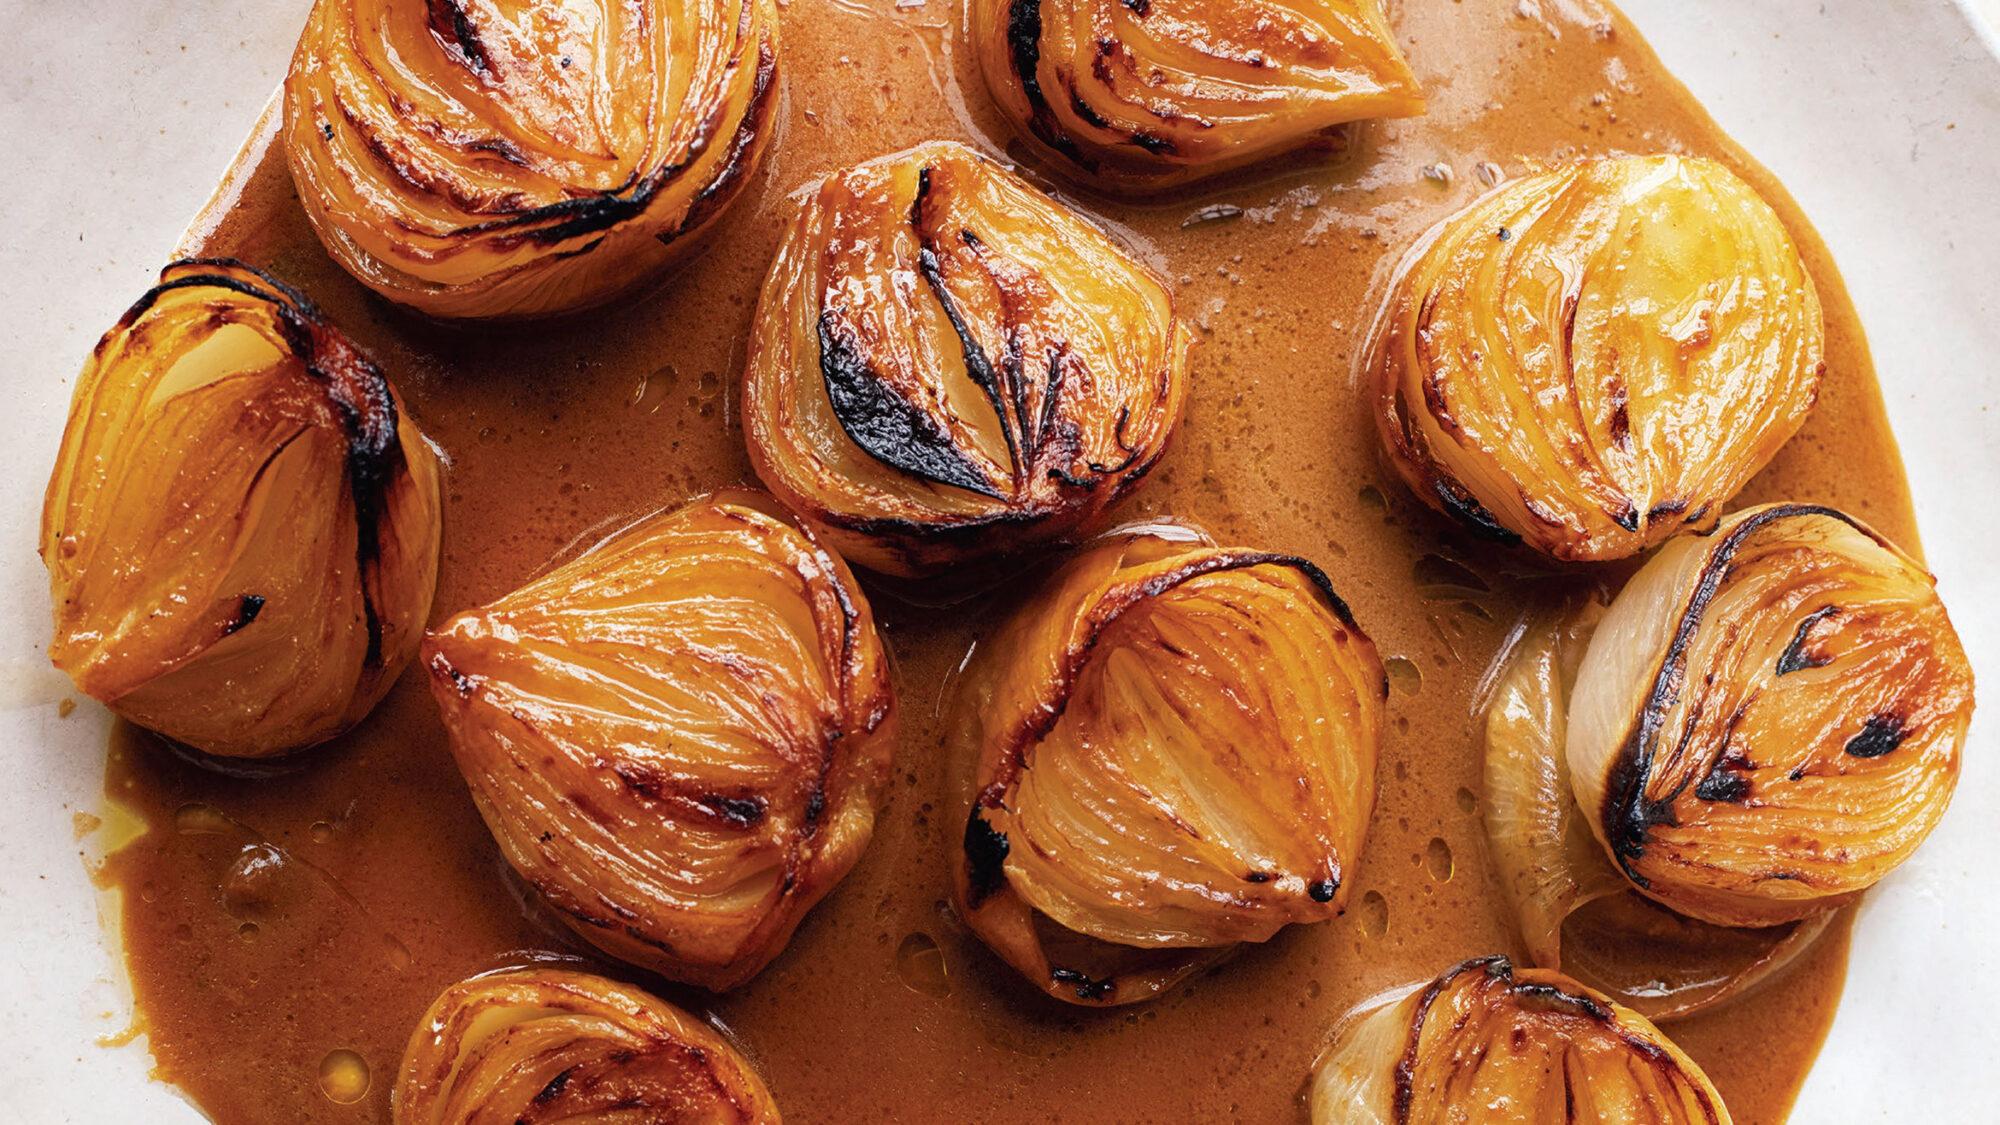 Article-Alliums-Onion-Recipe-Yotam-Ottolenghi-Flavor